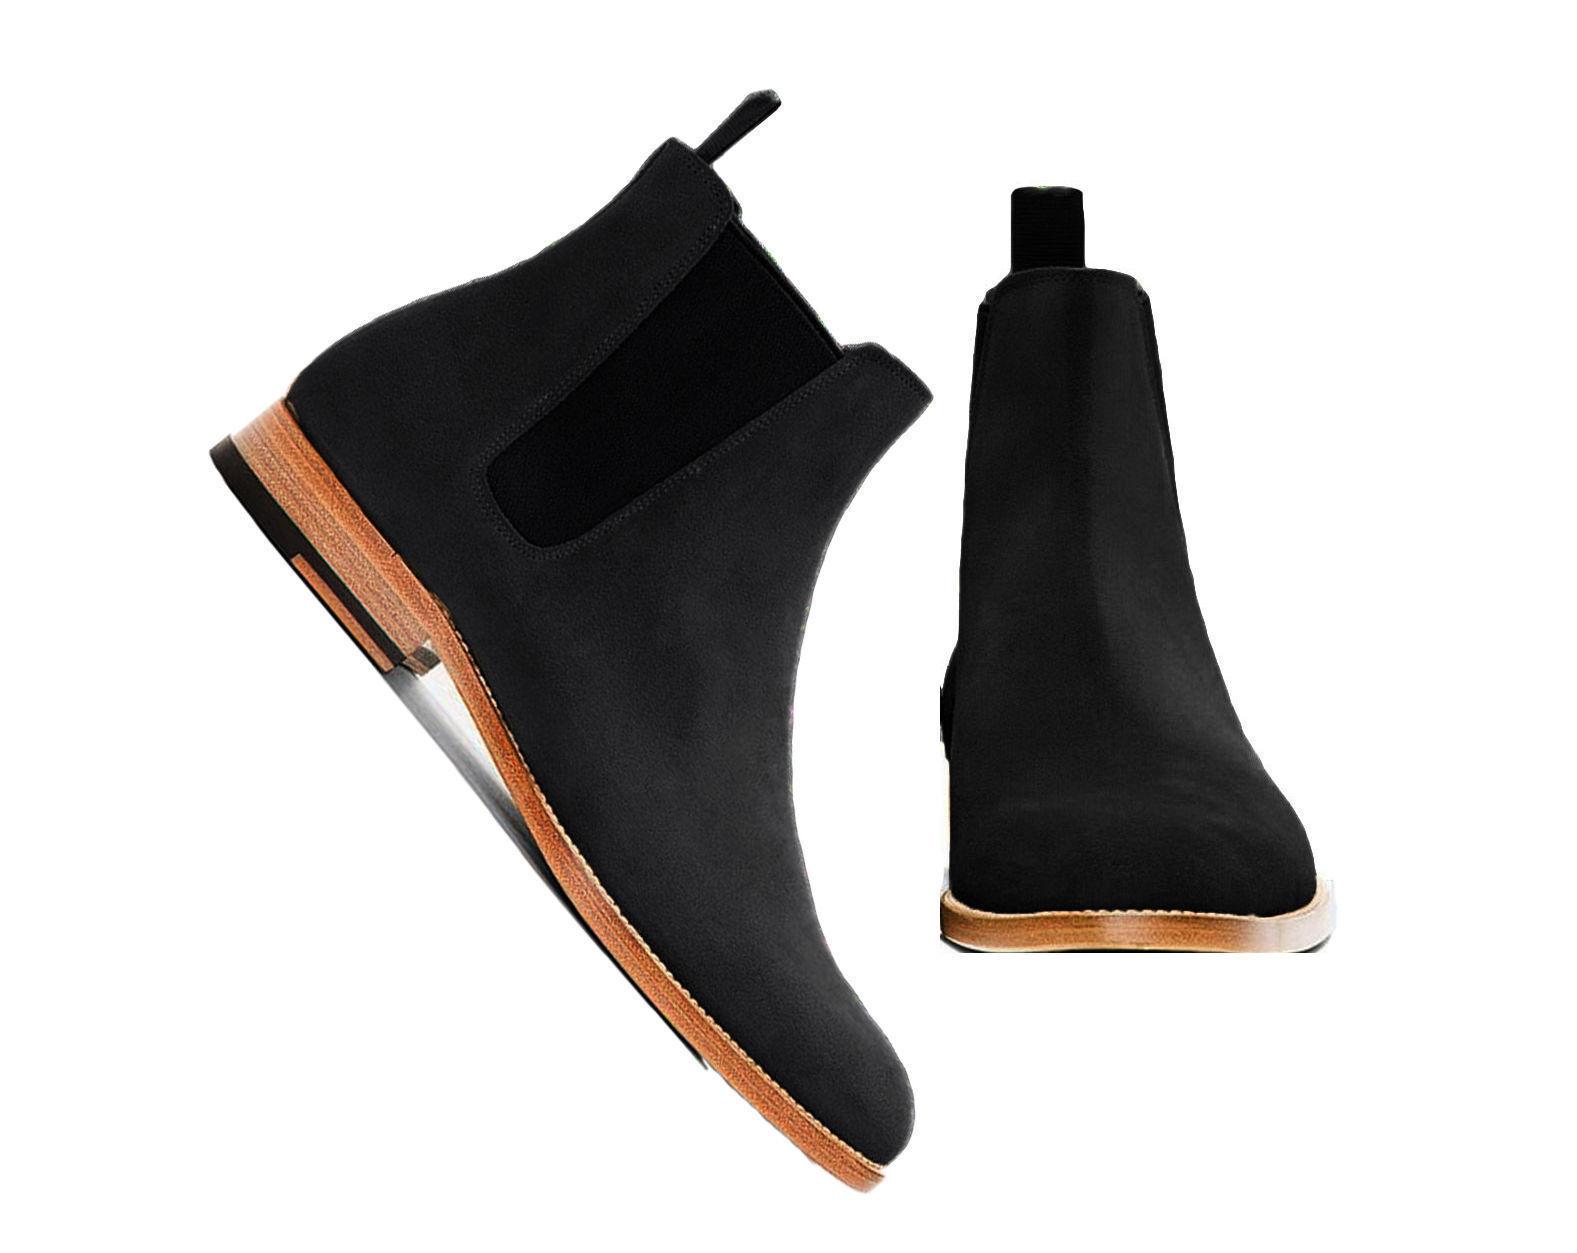 61e1c863 botas para hombre hecho a mano Negro Tobillo Alto Bota De Cuero Gamuza  medida Todas las Tallas De nrekrb2109-Botas